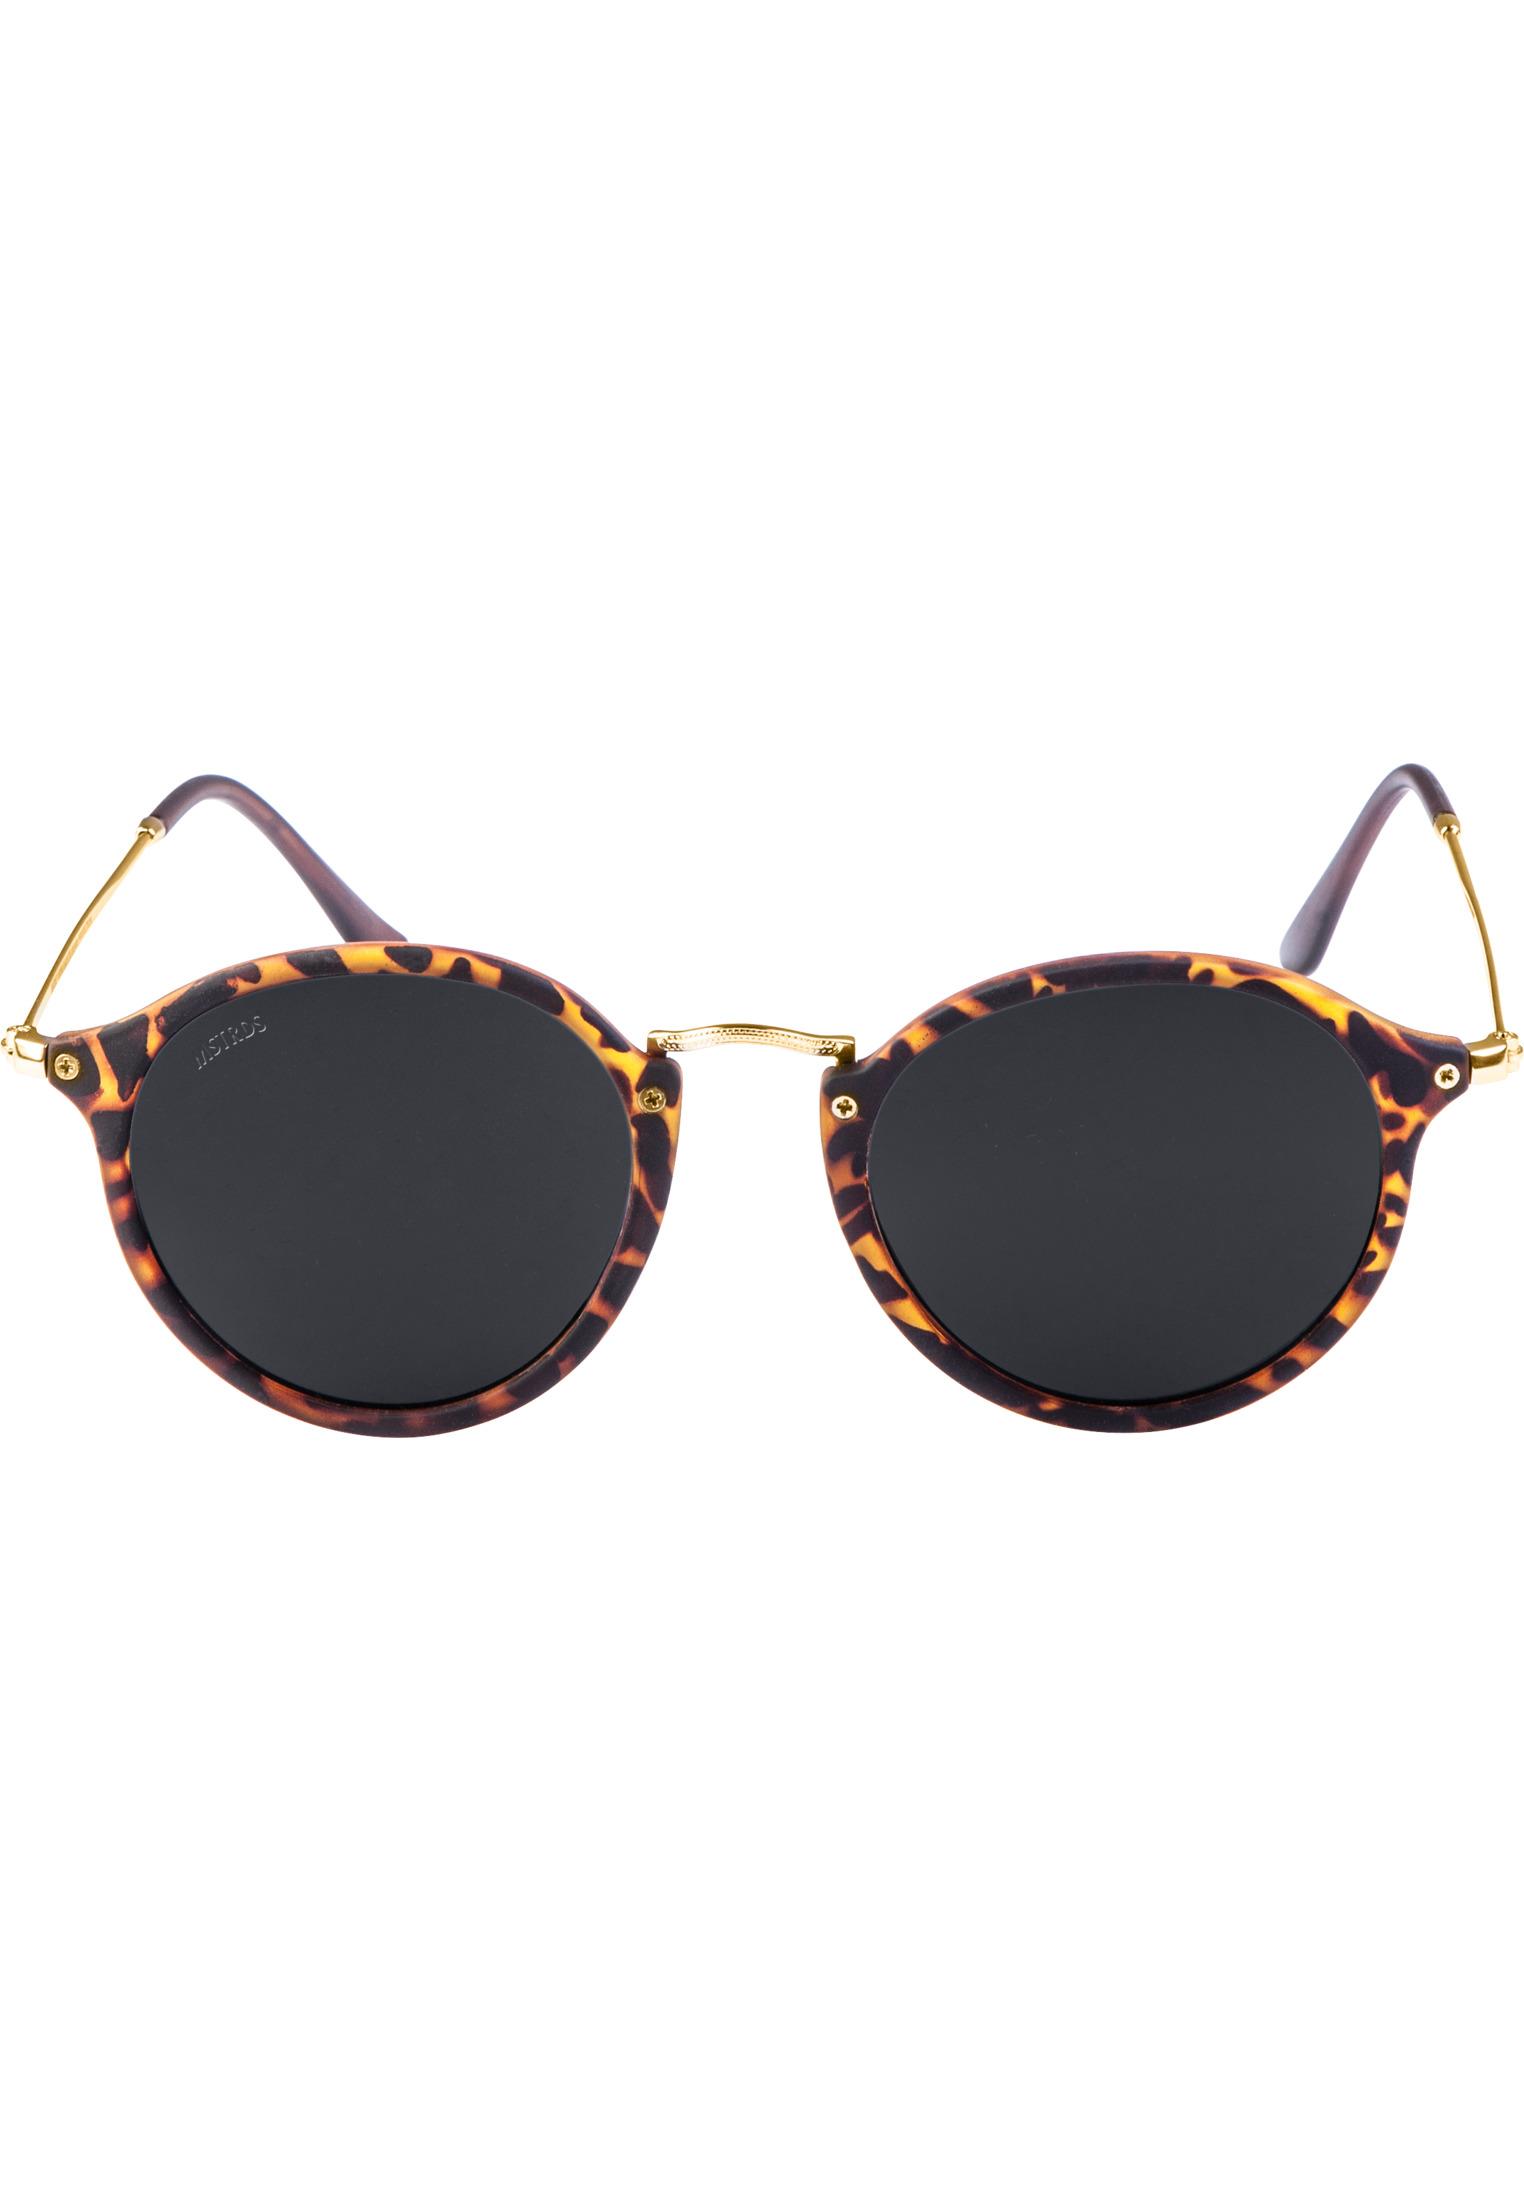 Urban Classics Sunglasses Spy blk/grn oArNw